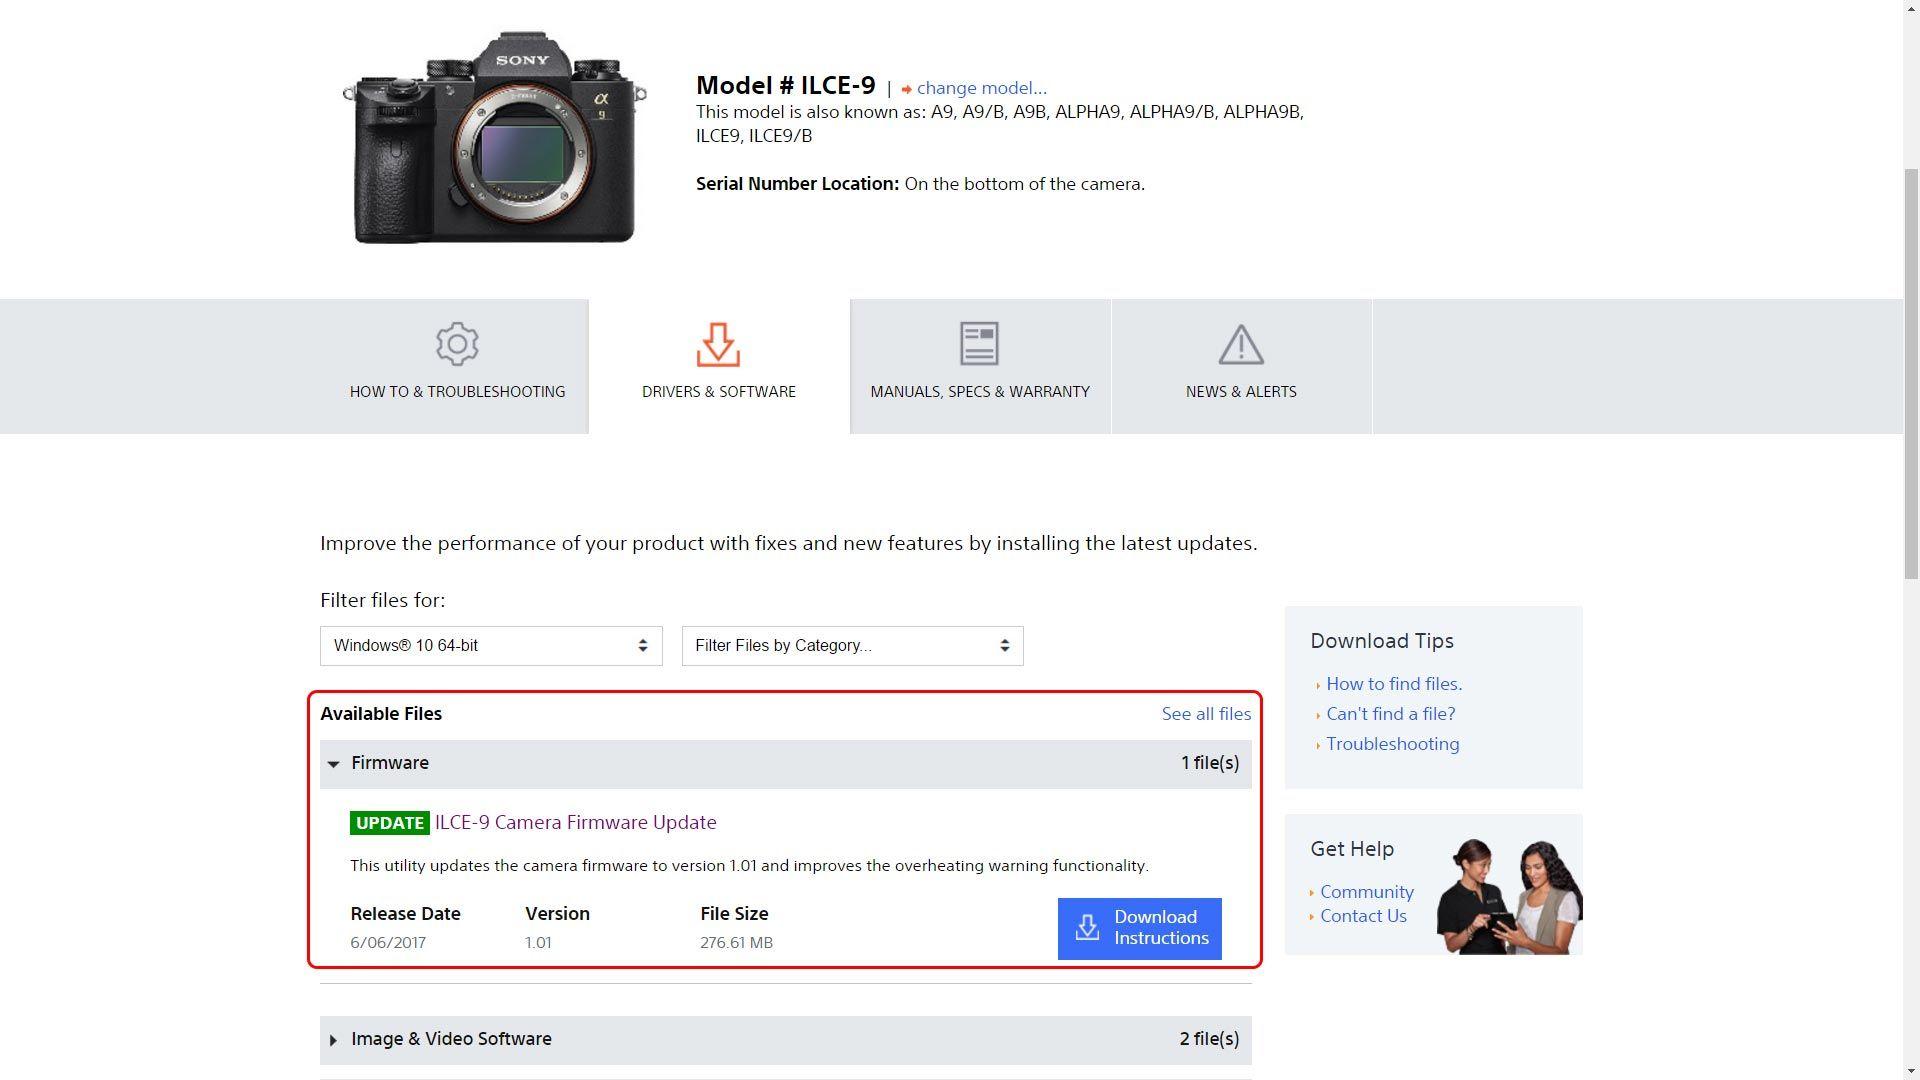 Hướng dẫn update firmware cho máy ảnh sony alpha